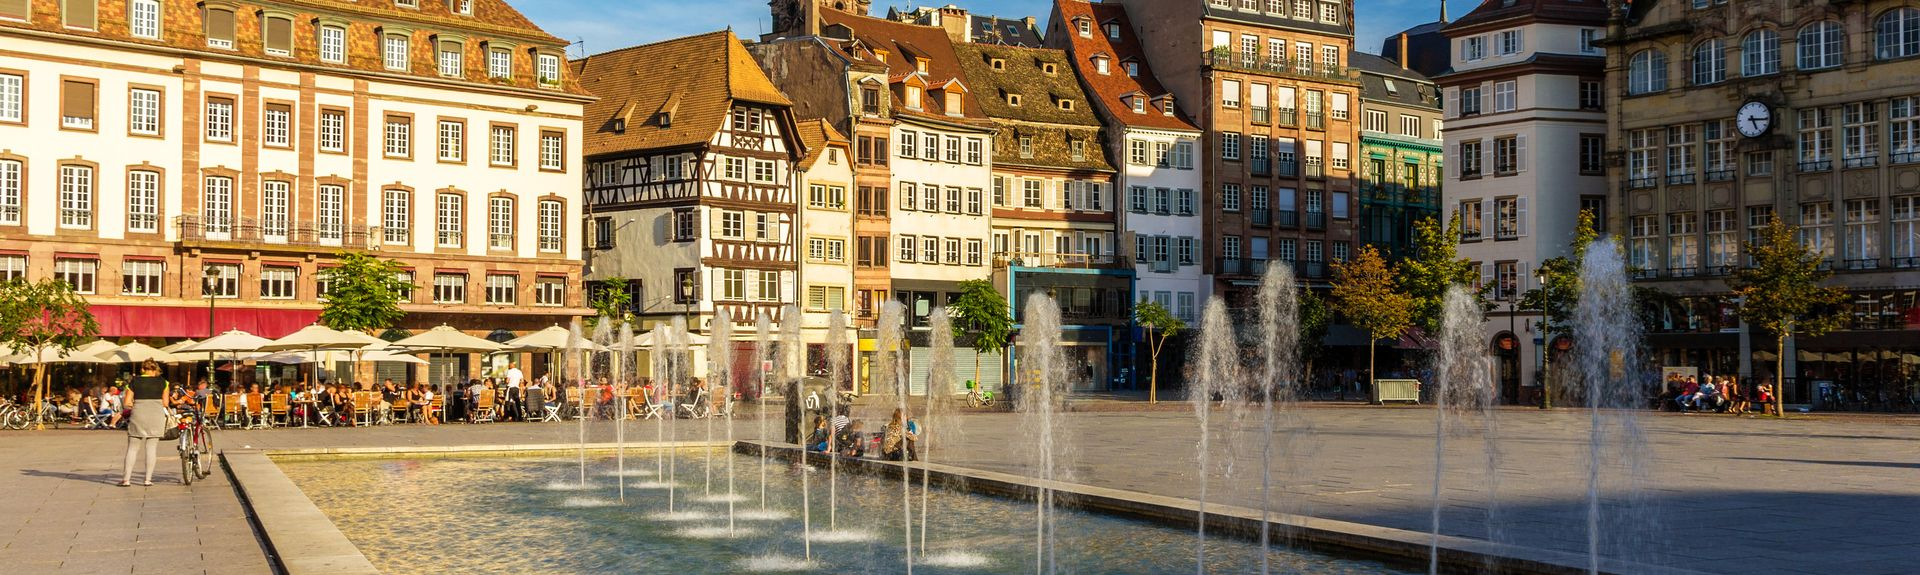 Strasbourg, Bas-Rhin (département), France